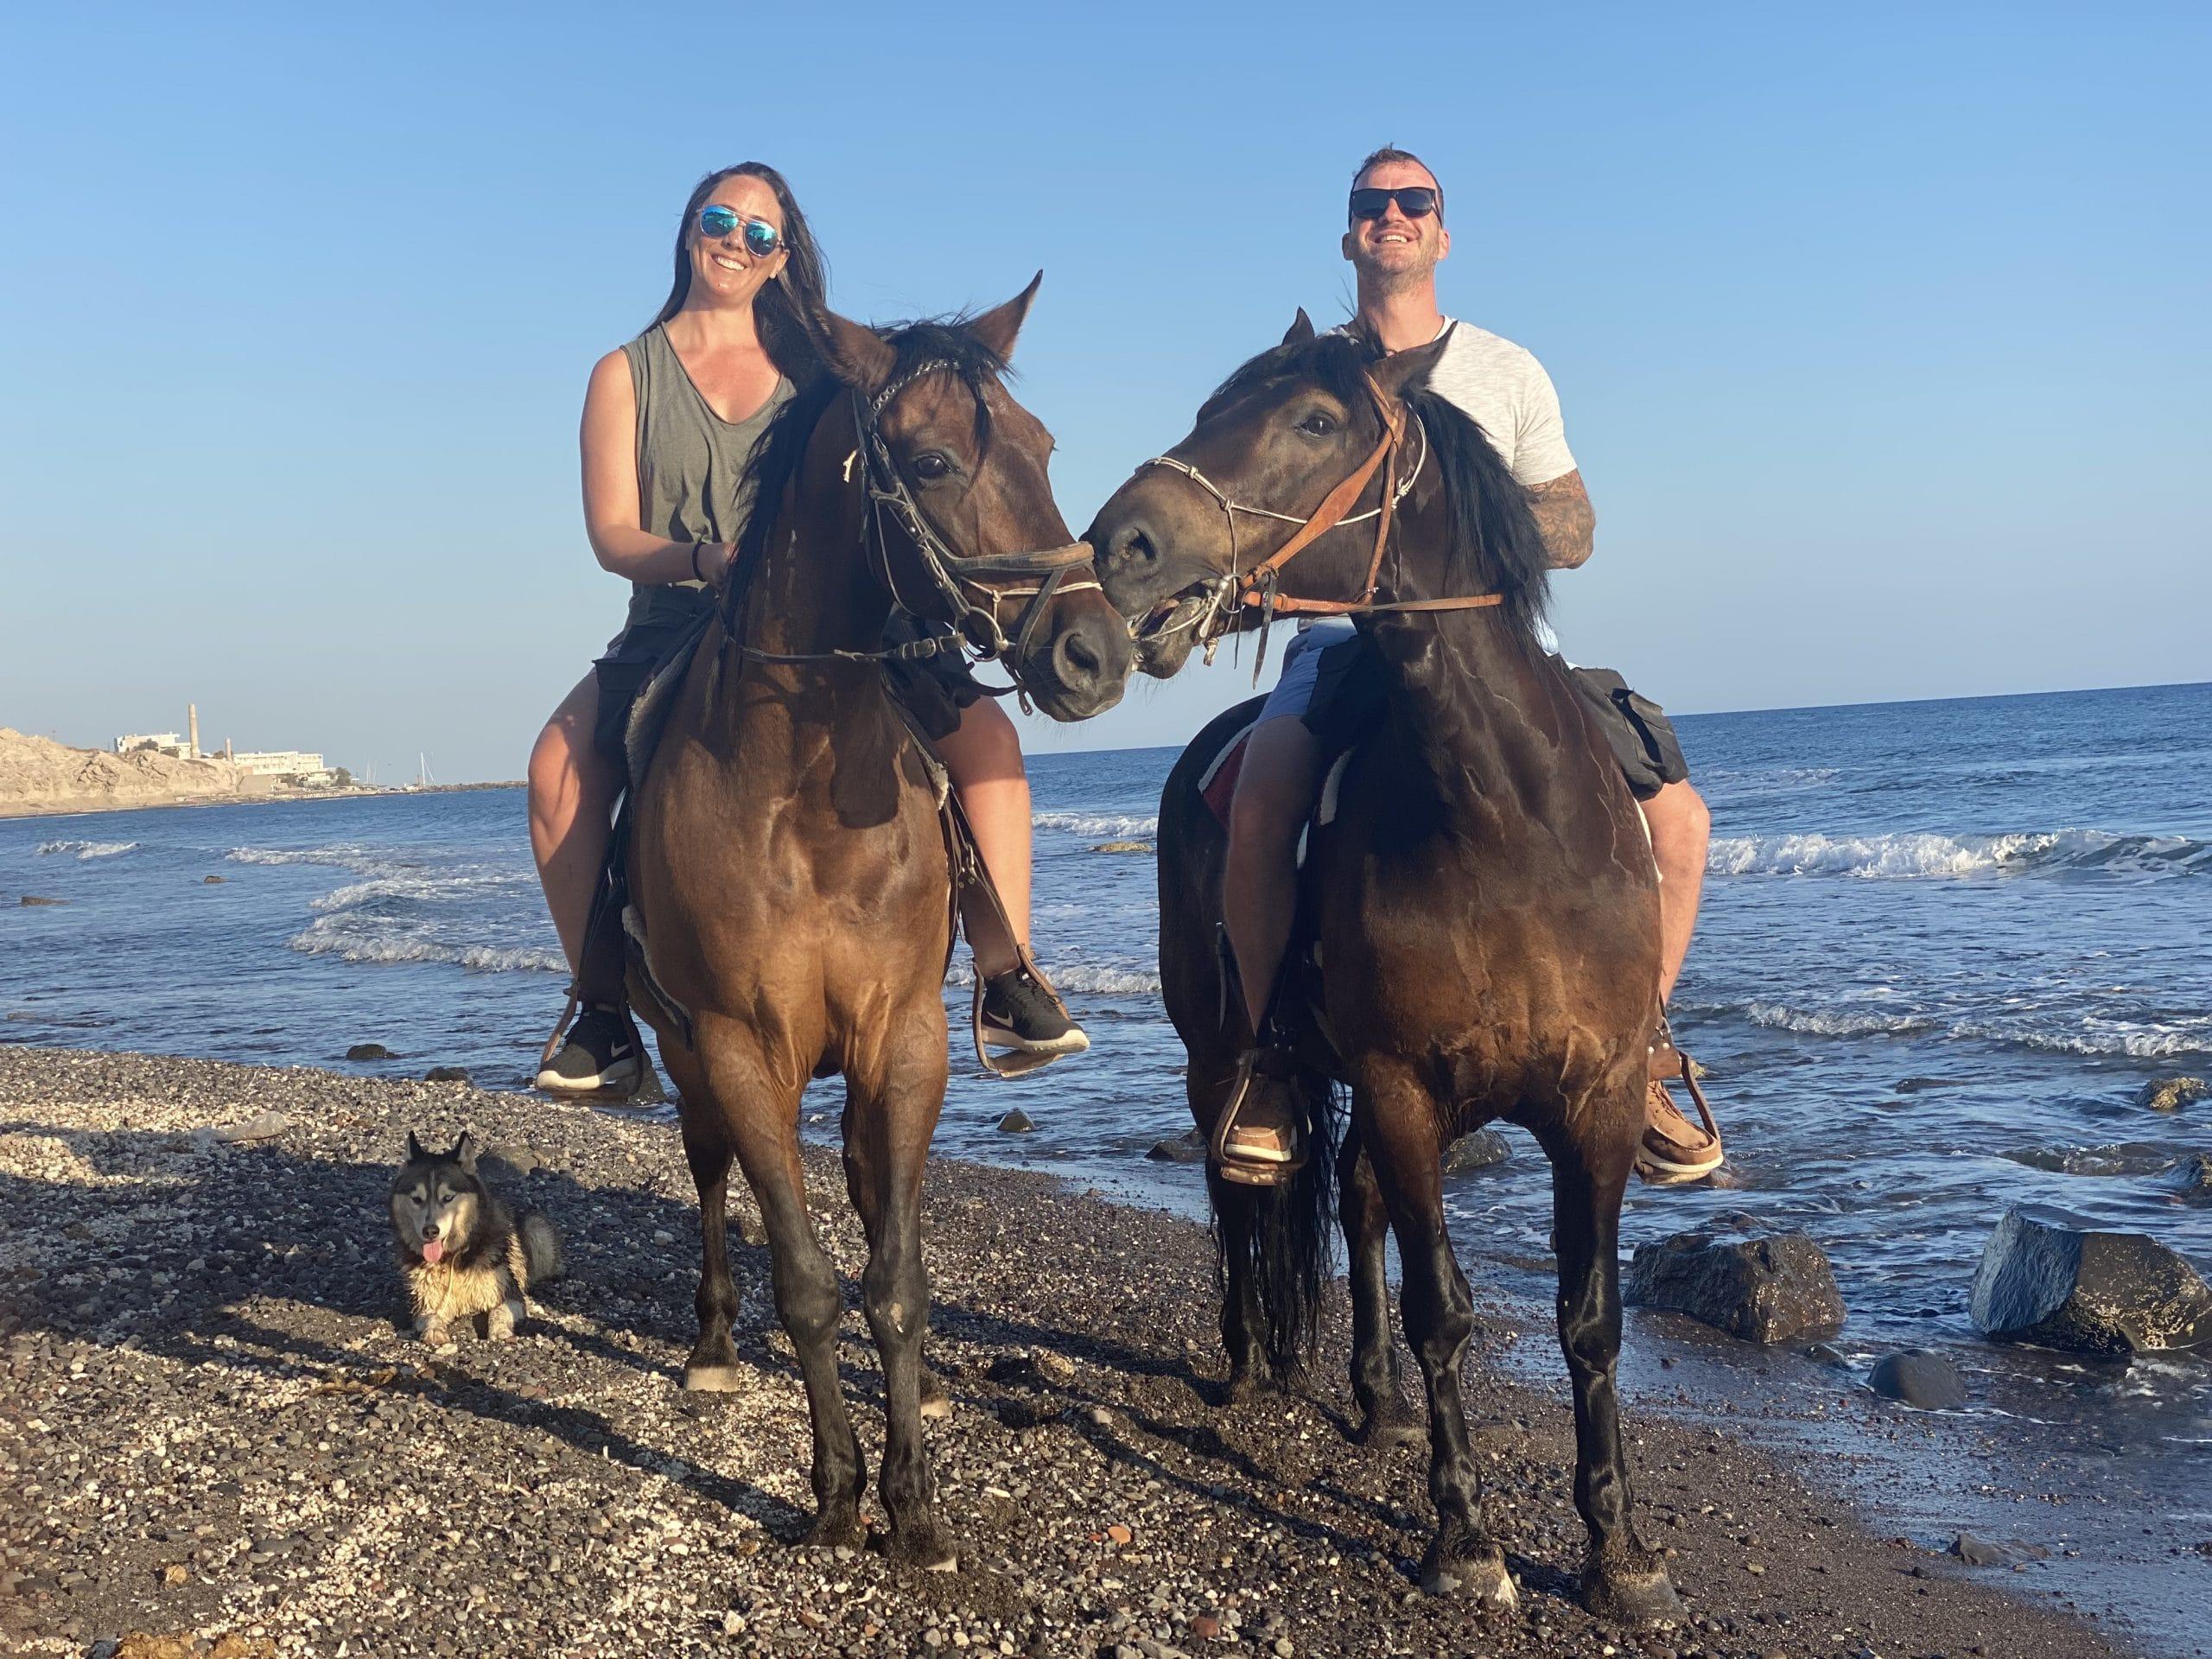 eric and lexy riding horses on the beach in santorini